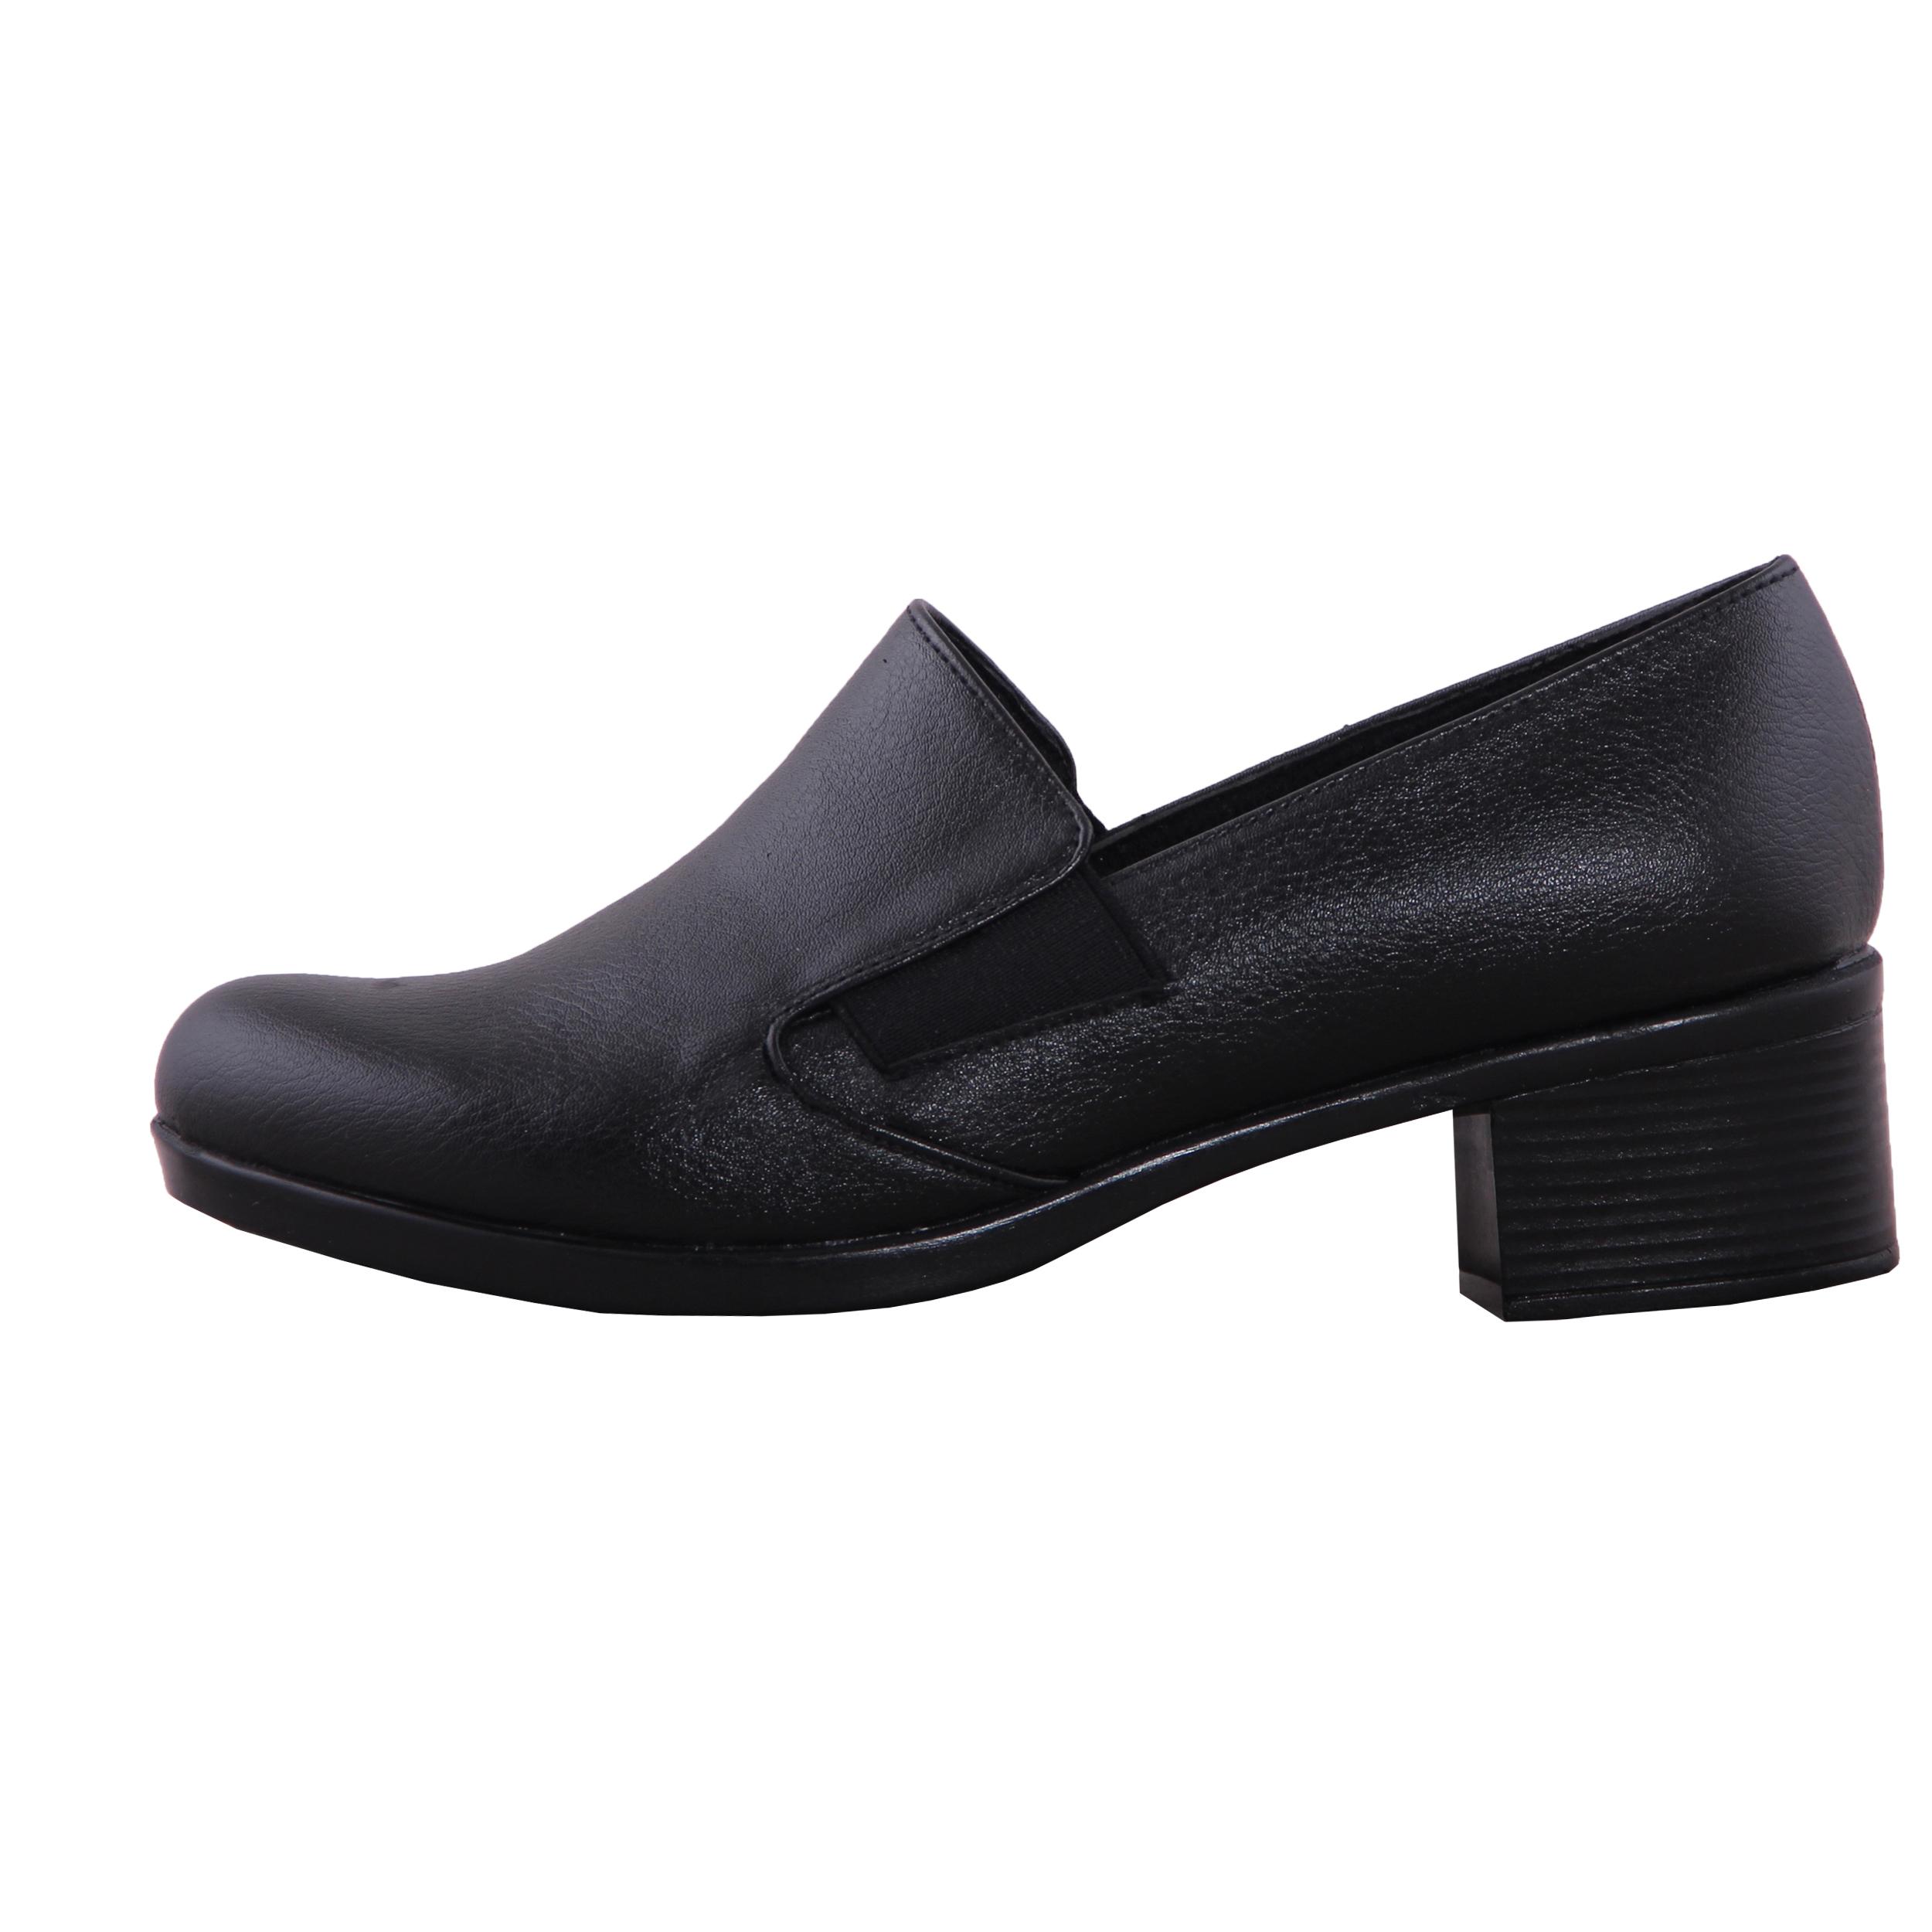 کفش زنانه کد 1-39959